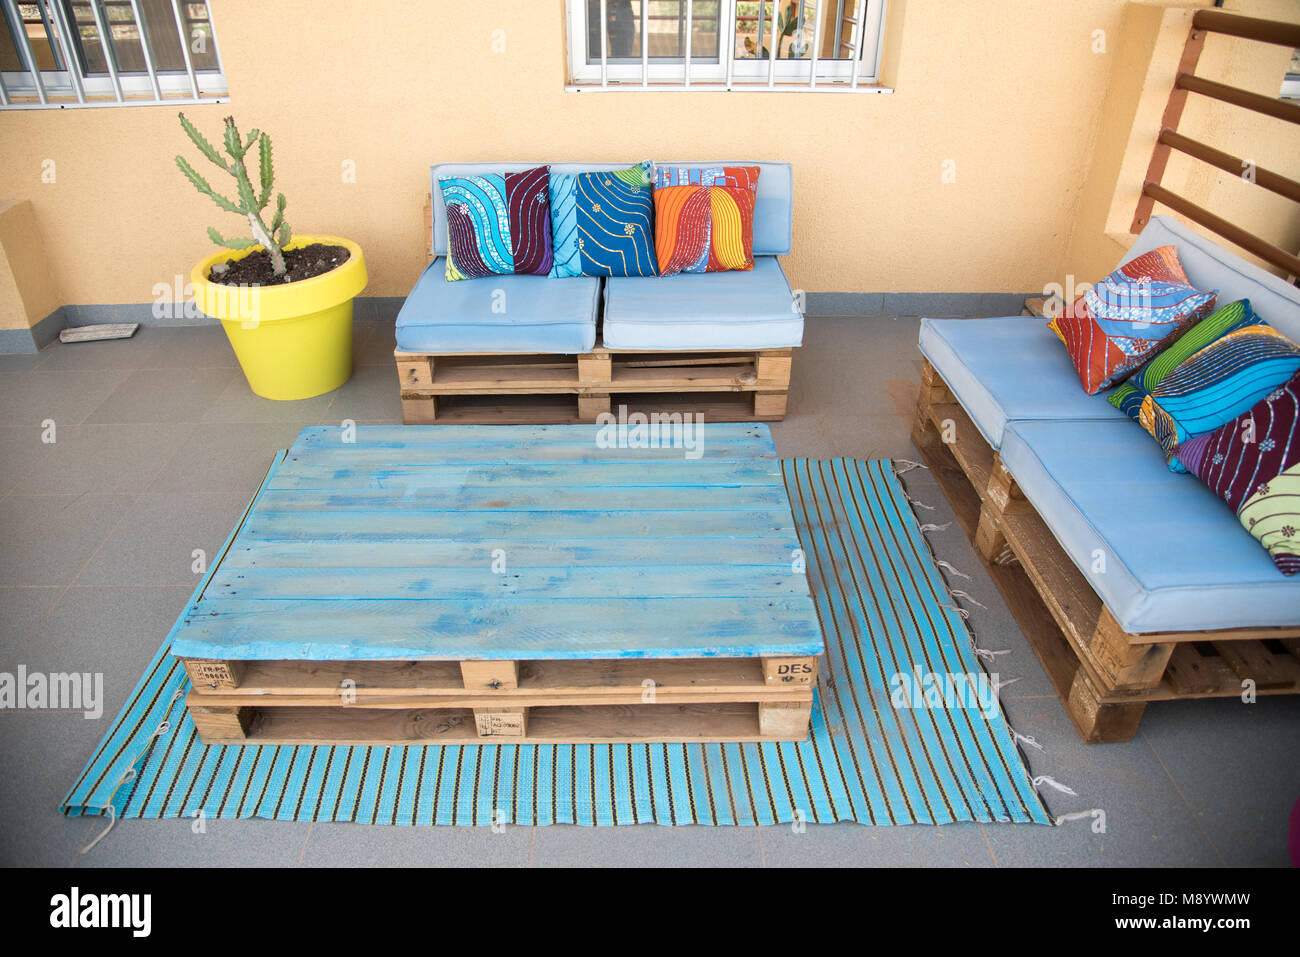 Cool Terrassenmobel Aus Holzpaletten Blau Lackiert Mit Kraftigen